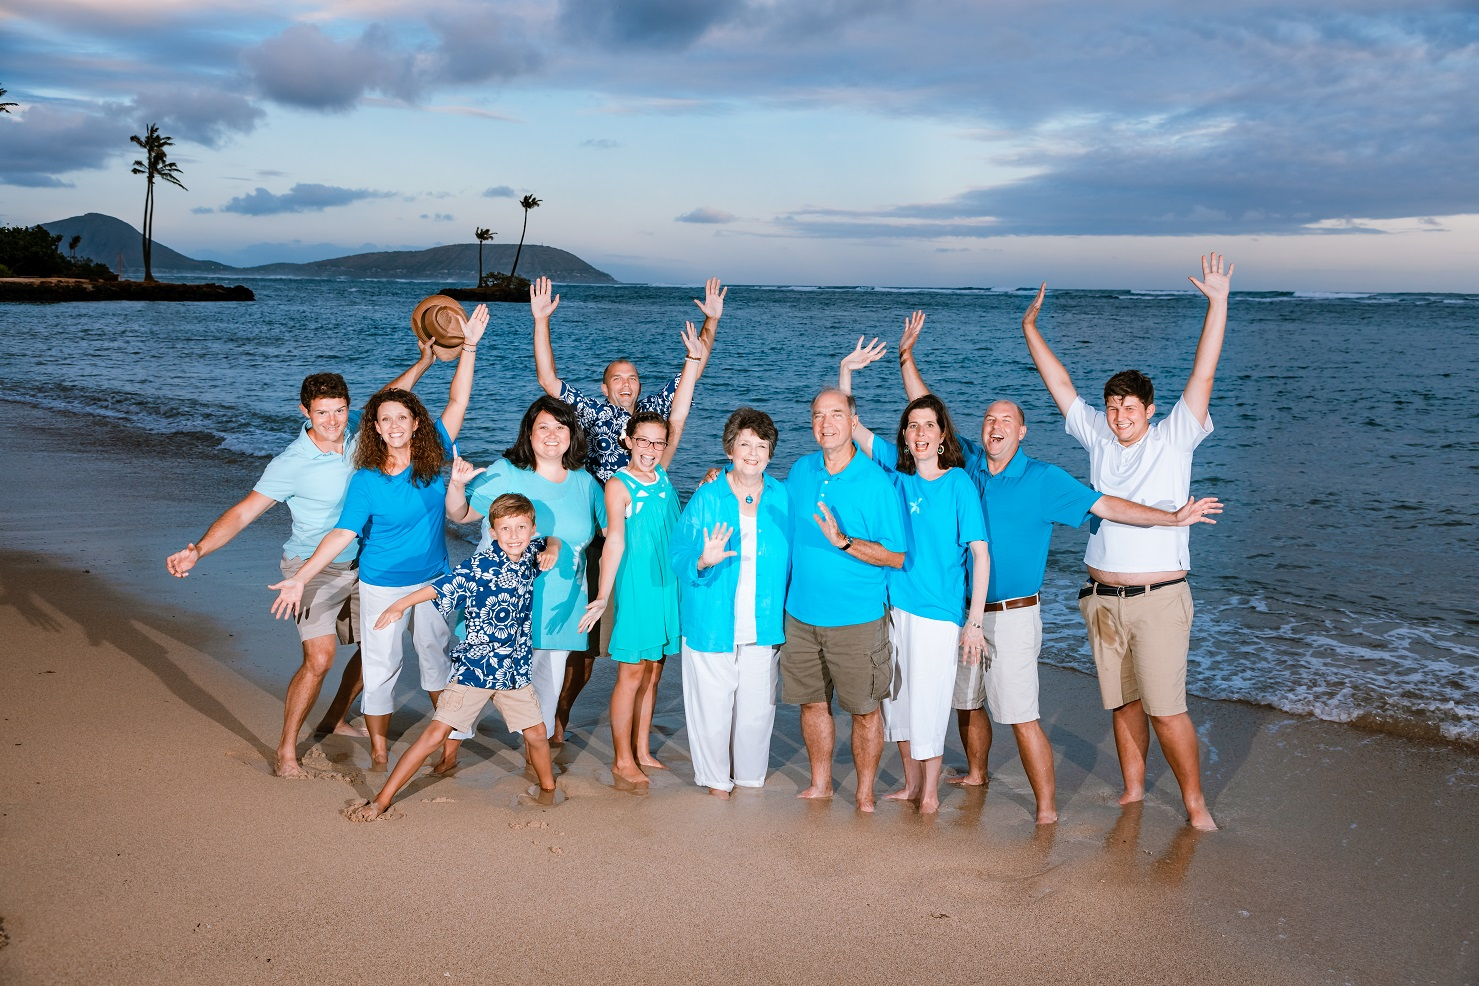 multi family generation portrait oahu beach hawaii sunset